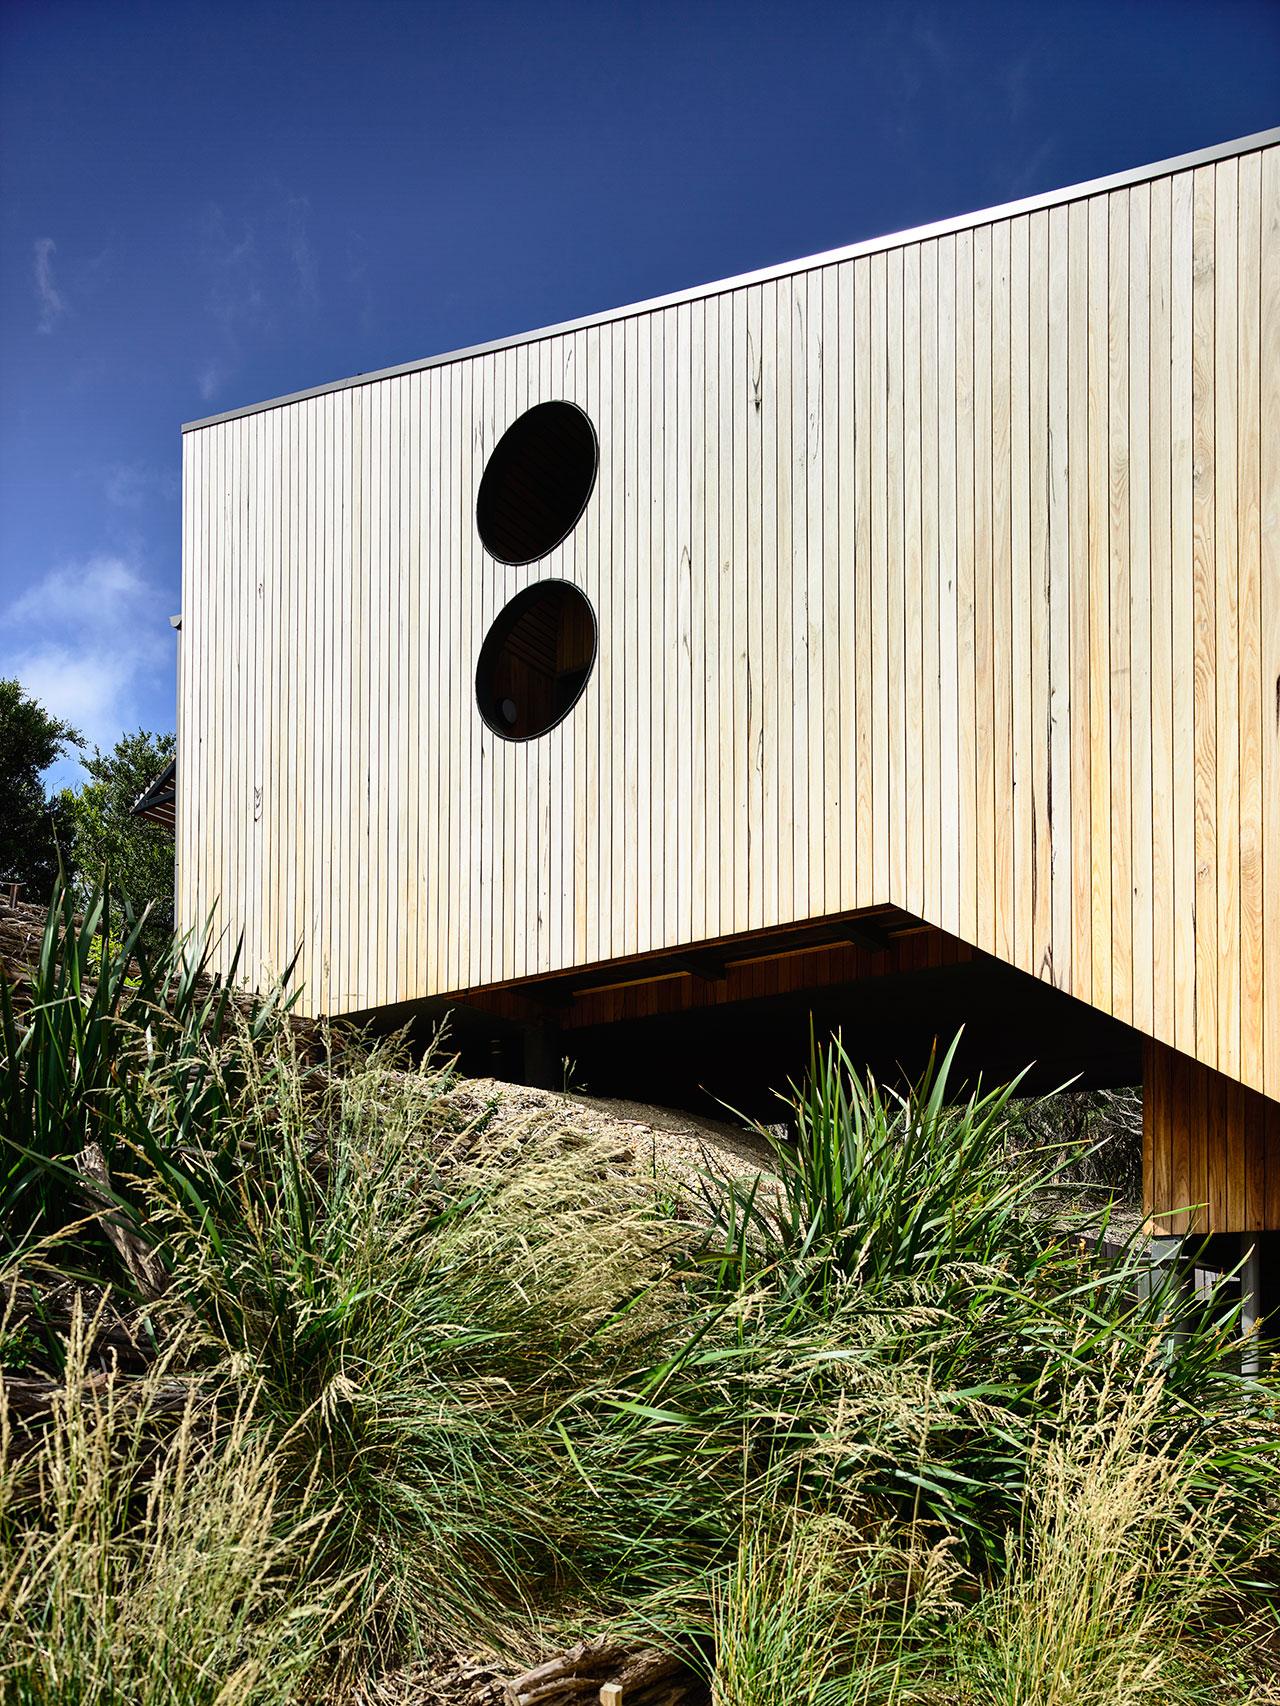 Sandy Point House by Kennedy Nolan Architects. Photo by Derek Swalwell.